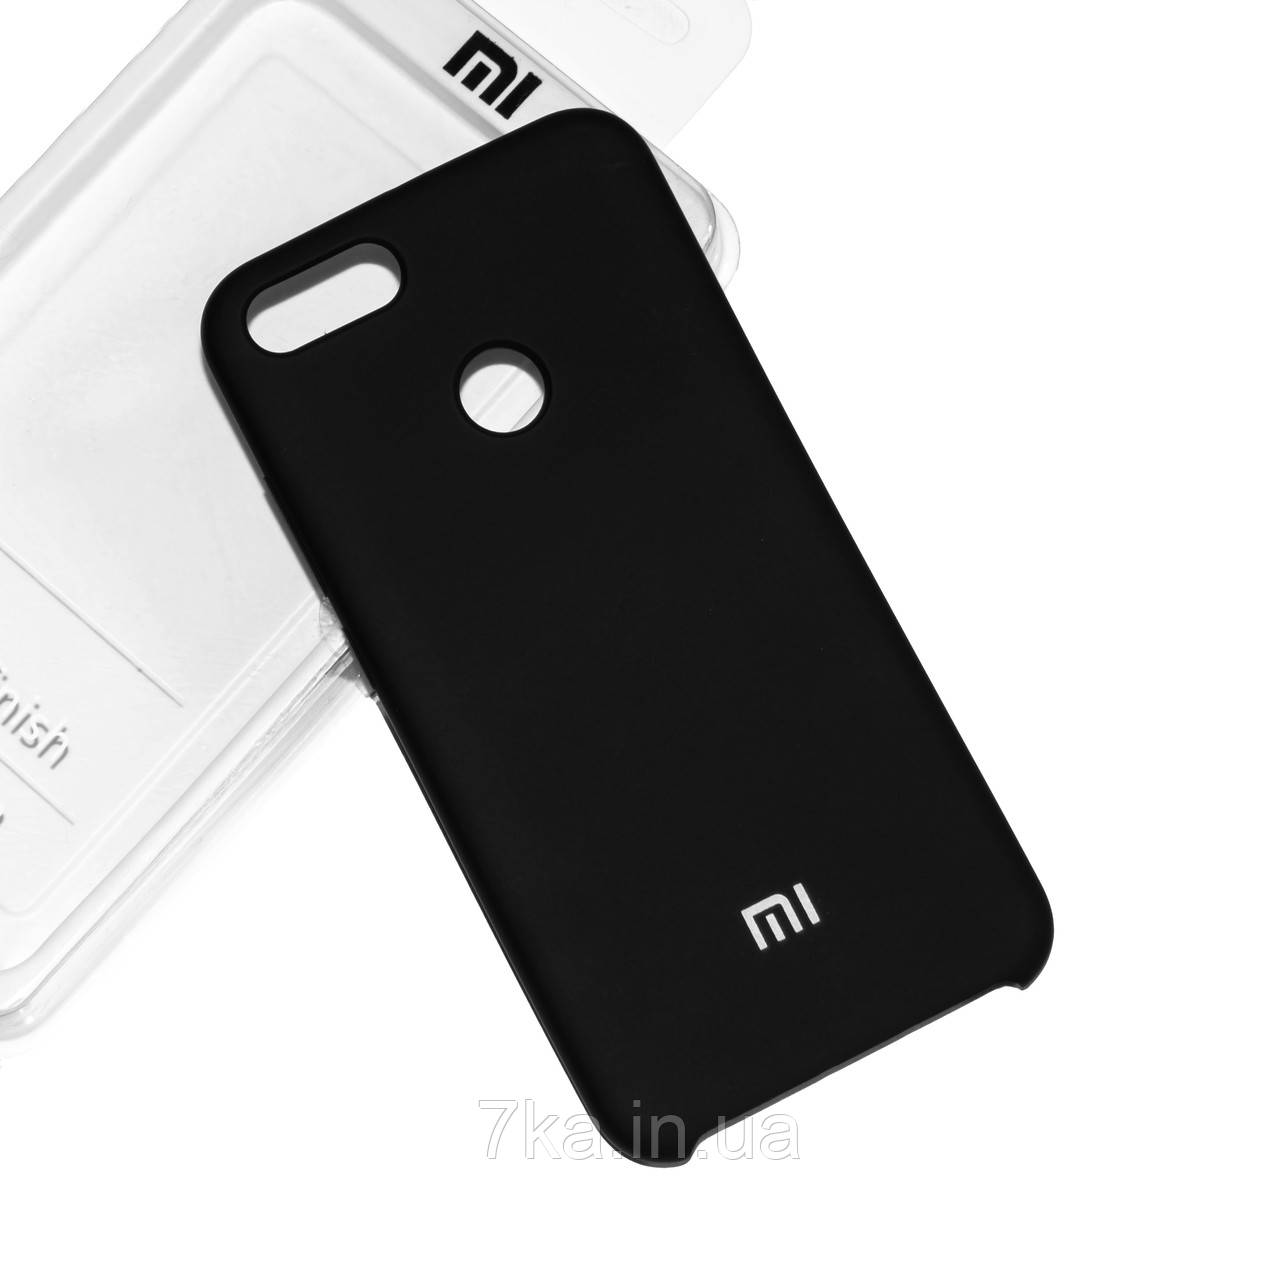 Силиконовый чехол на Xiaomi Mi 5X/ Mi A1 Soft-touch Black